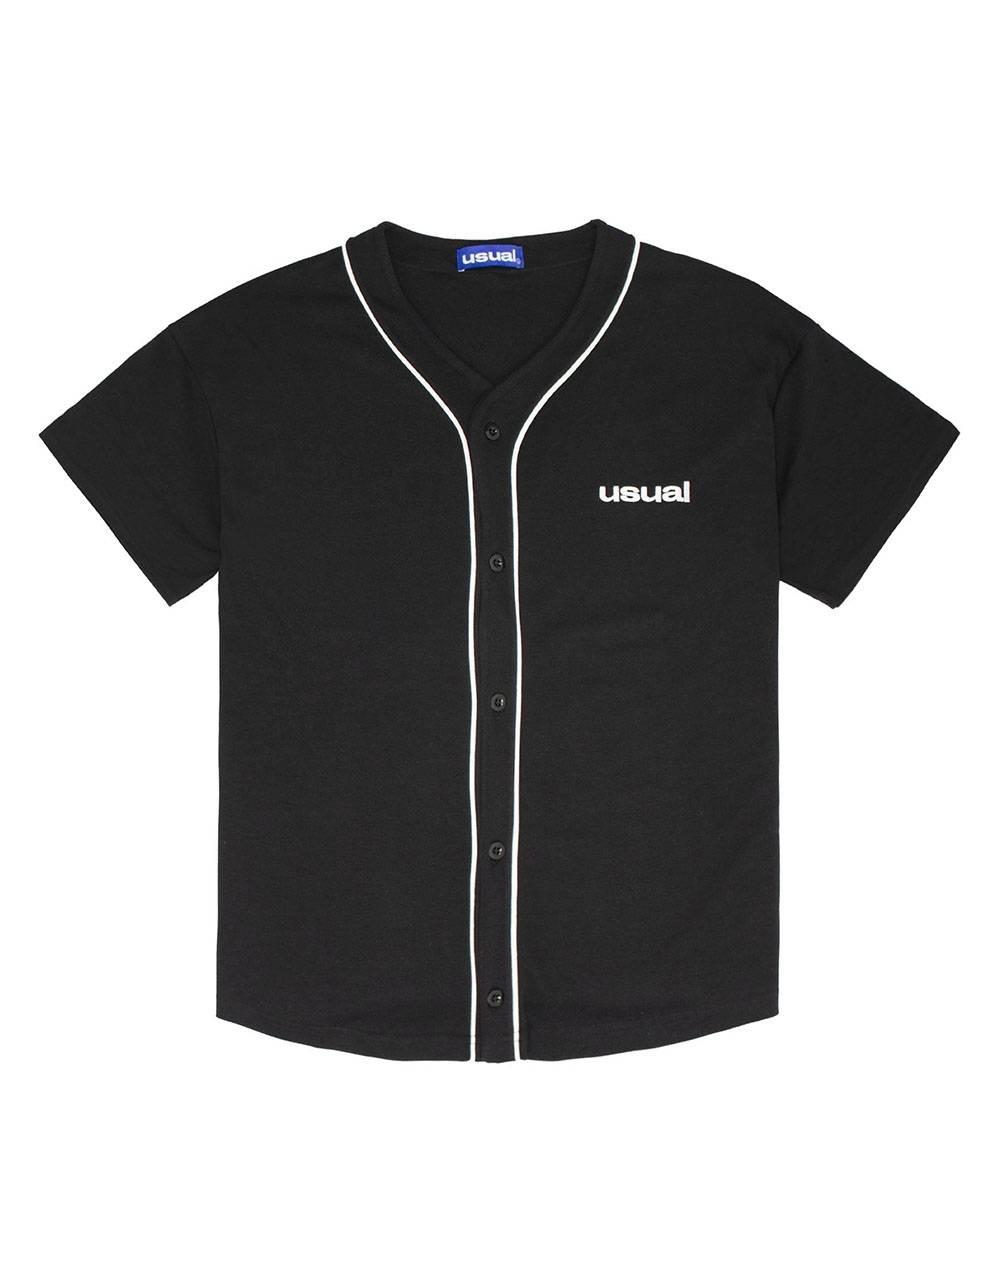 Usual Home Run Baseball Shirt - black Usual T-shirt 102,46€